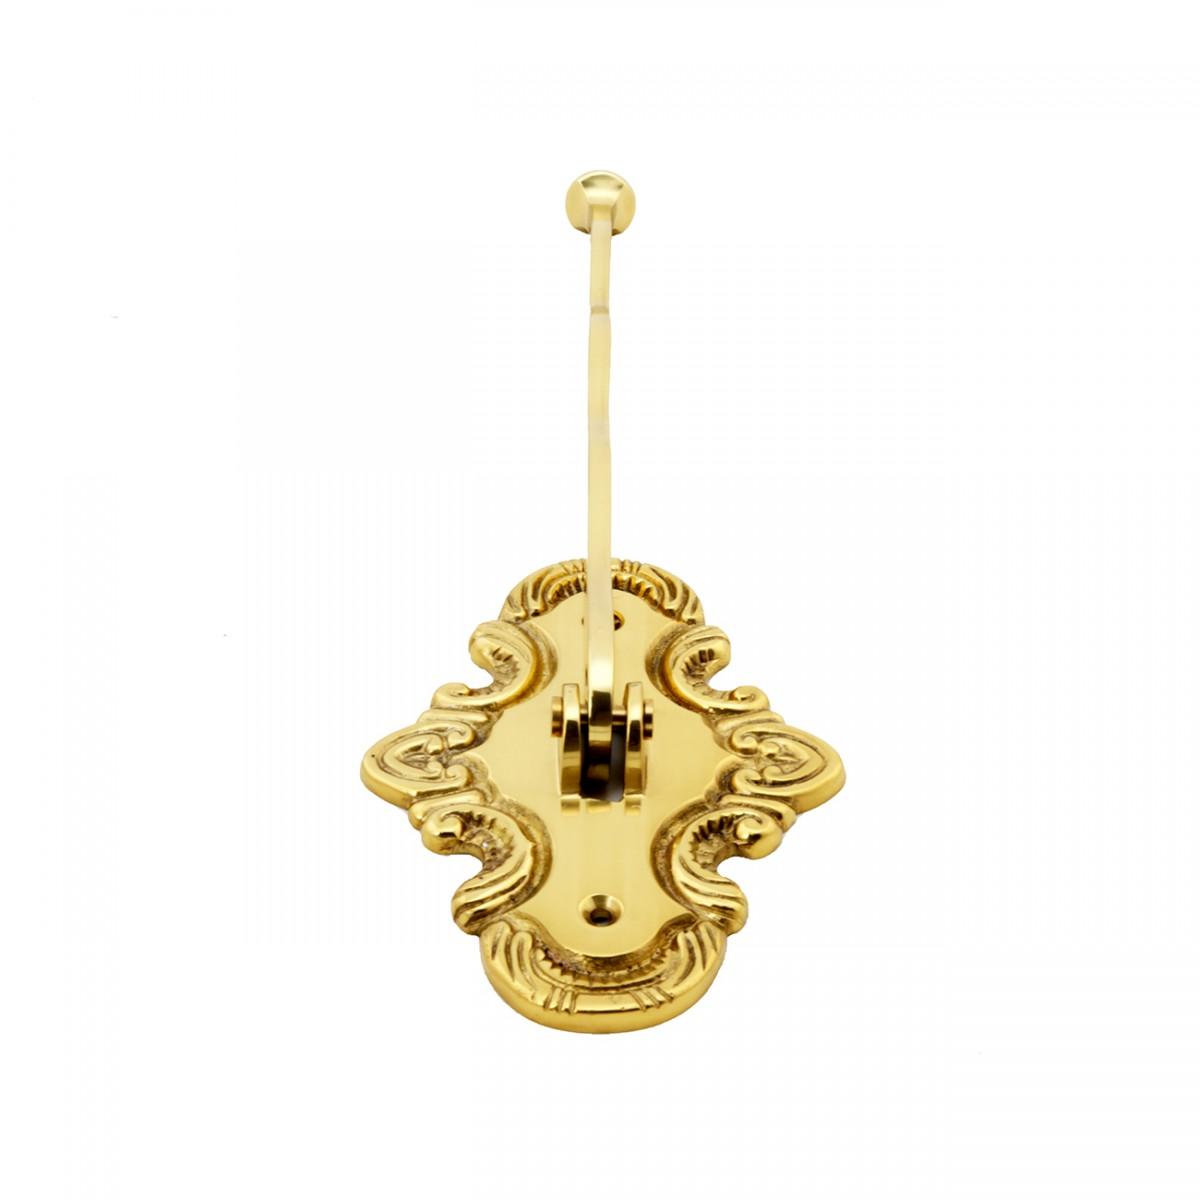 Solid Brass Clothes Hook Rack Folding Robe Hangers Hooks Decorative Hook Coat Hook